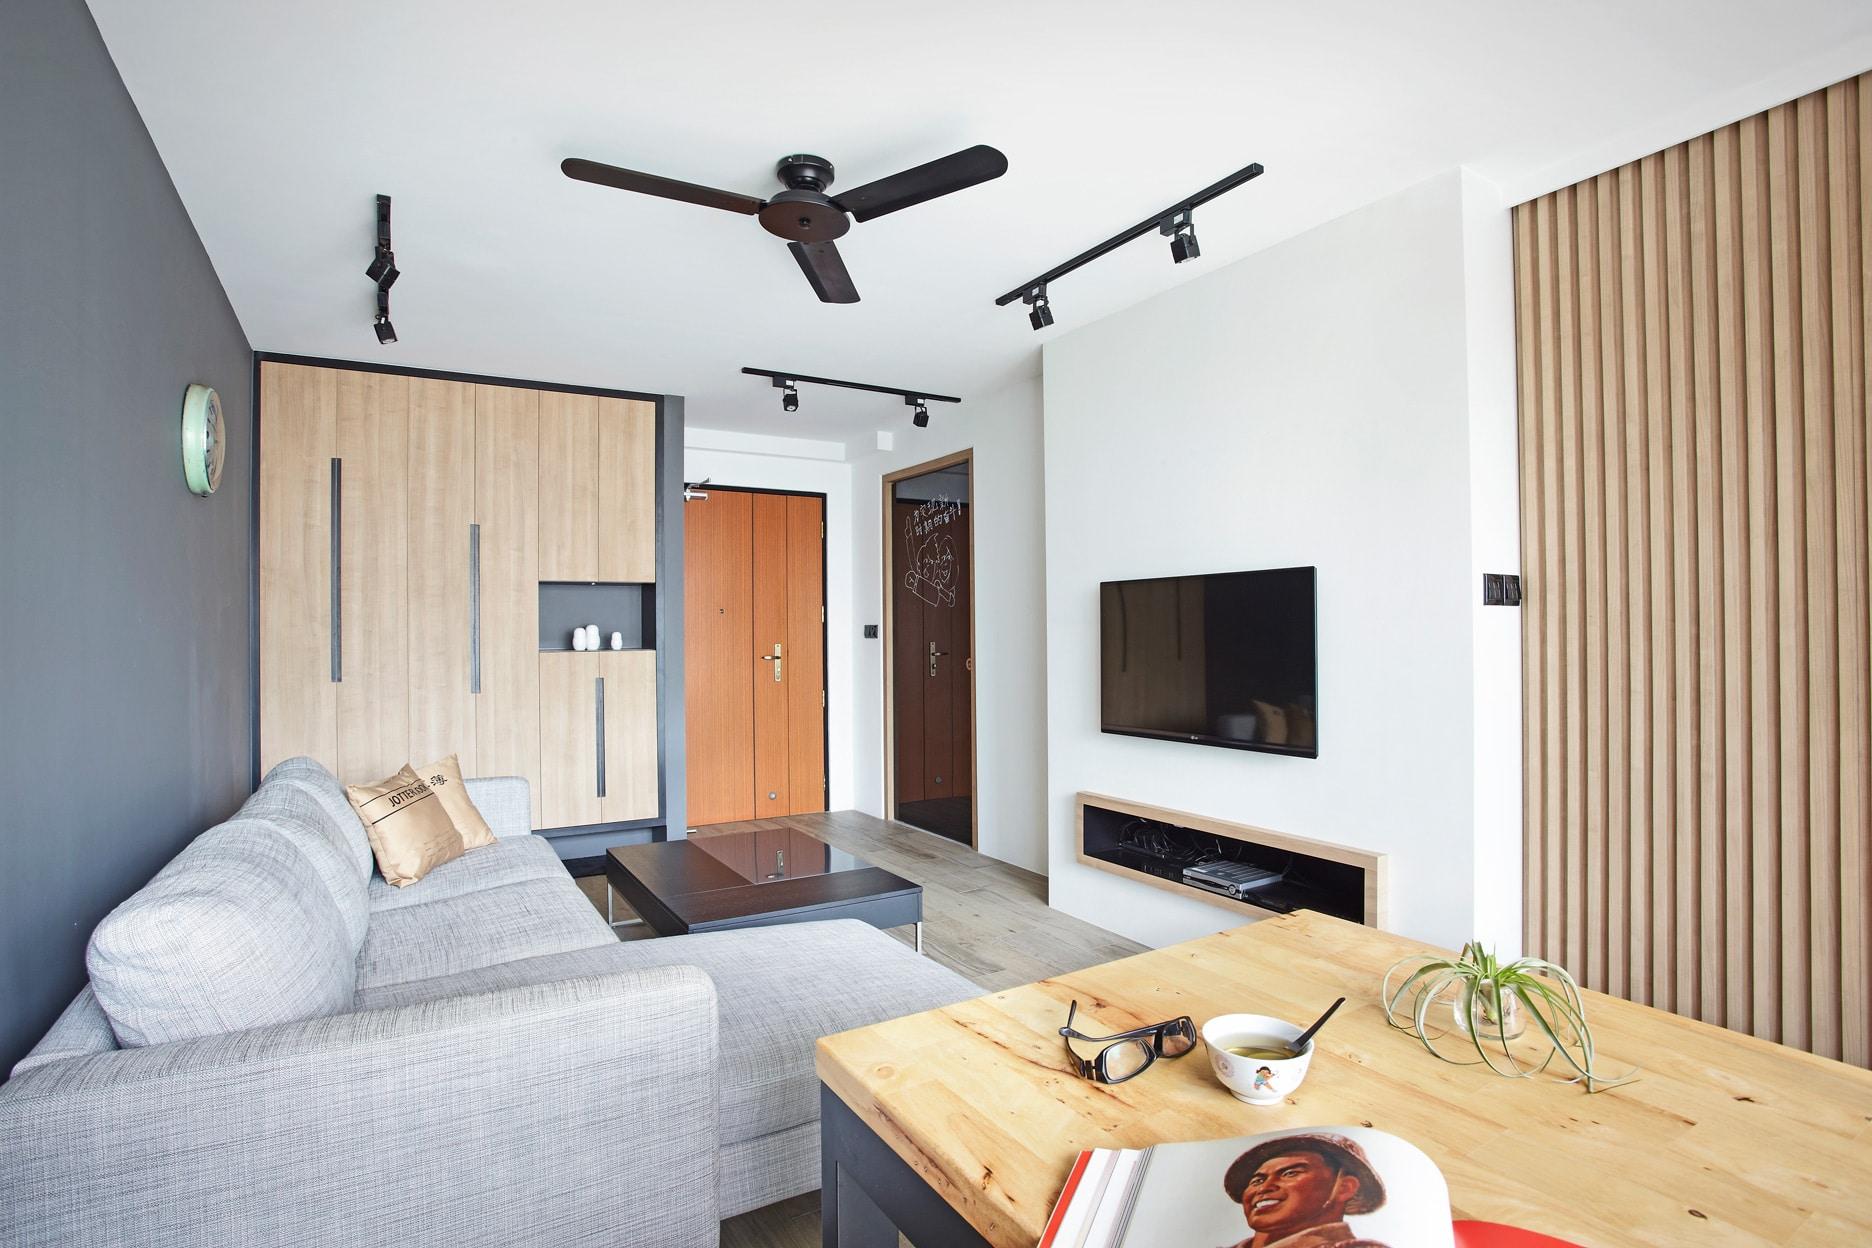 Organized and comfortable interior design - How to bill for interior design services ...